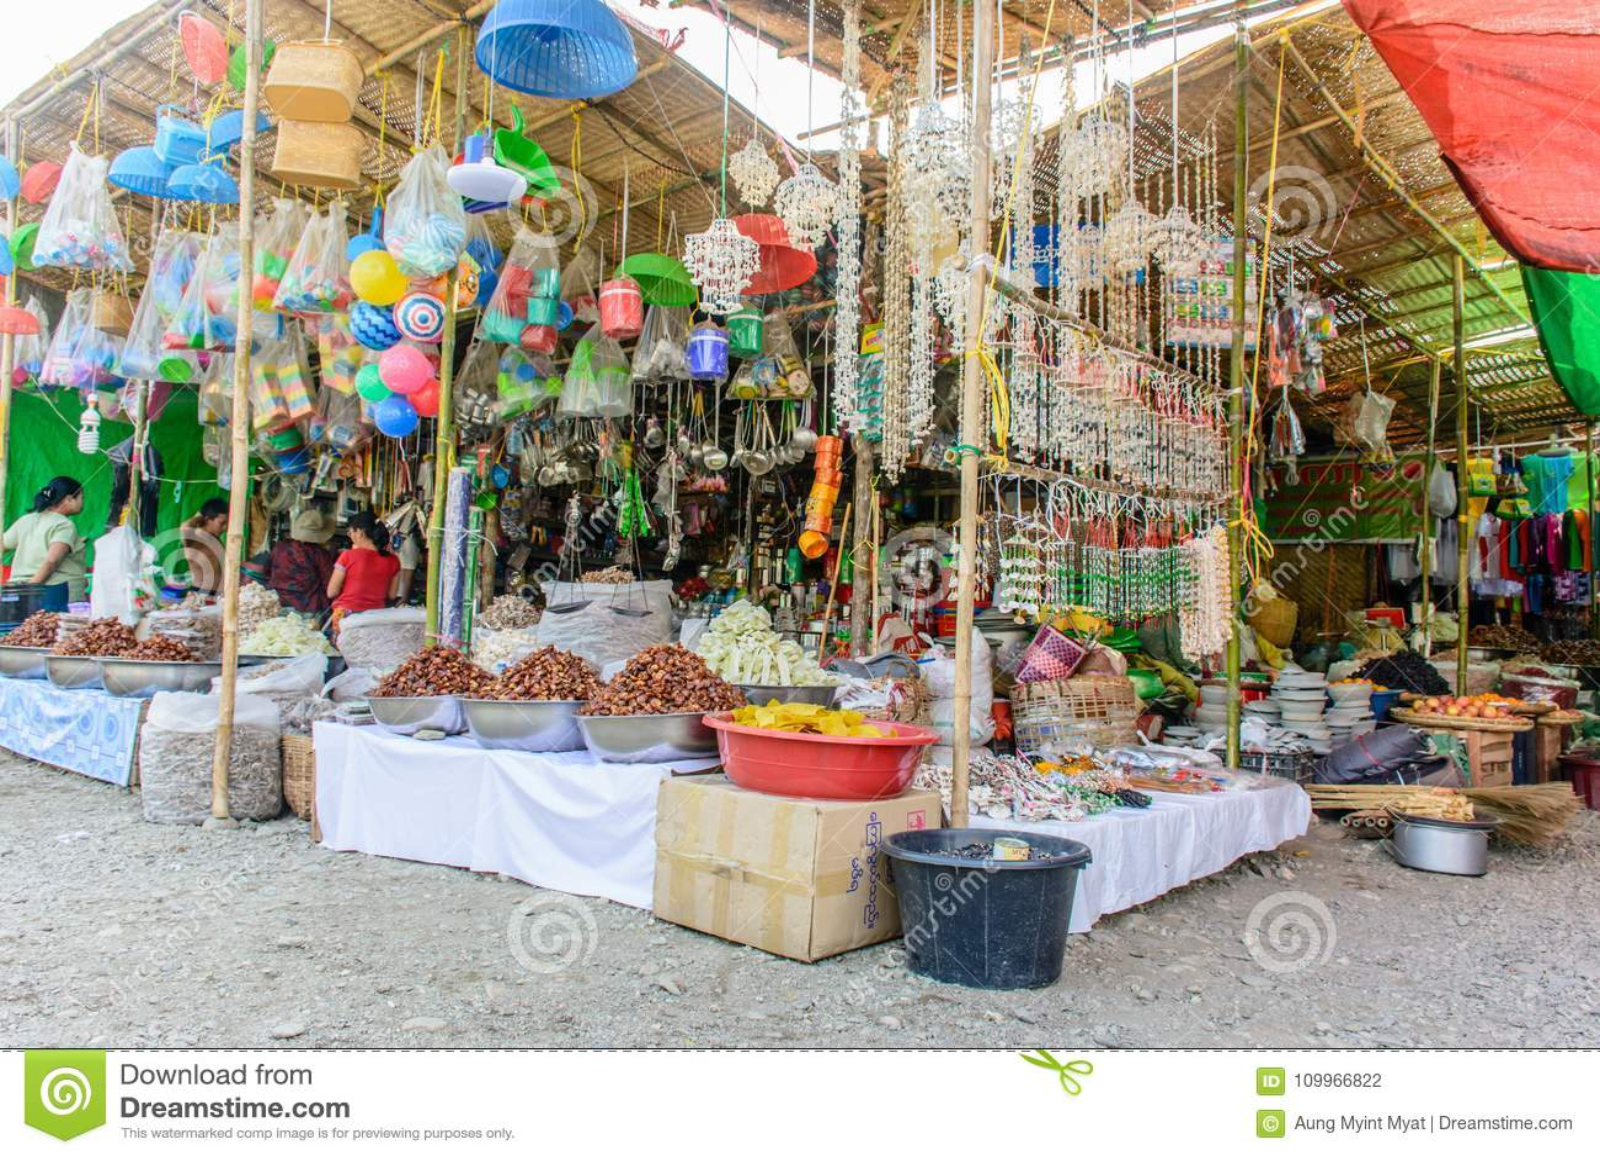 Photo Of Temporary Shops At `Shwe Set Taw` Pagoda Festival